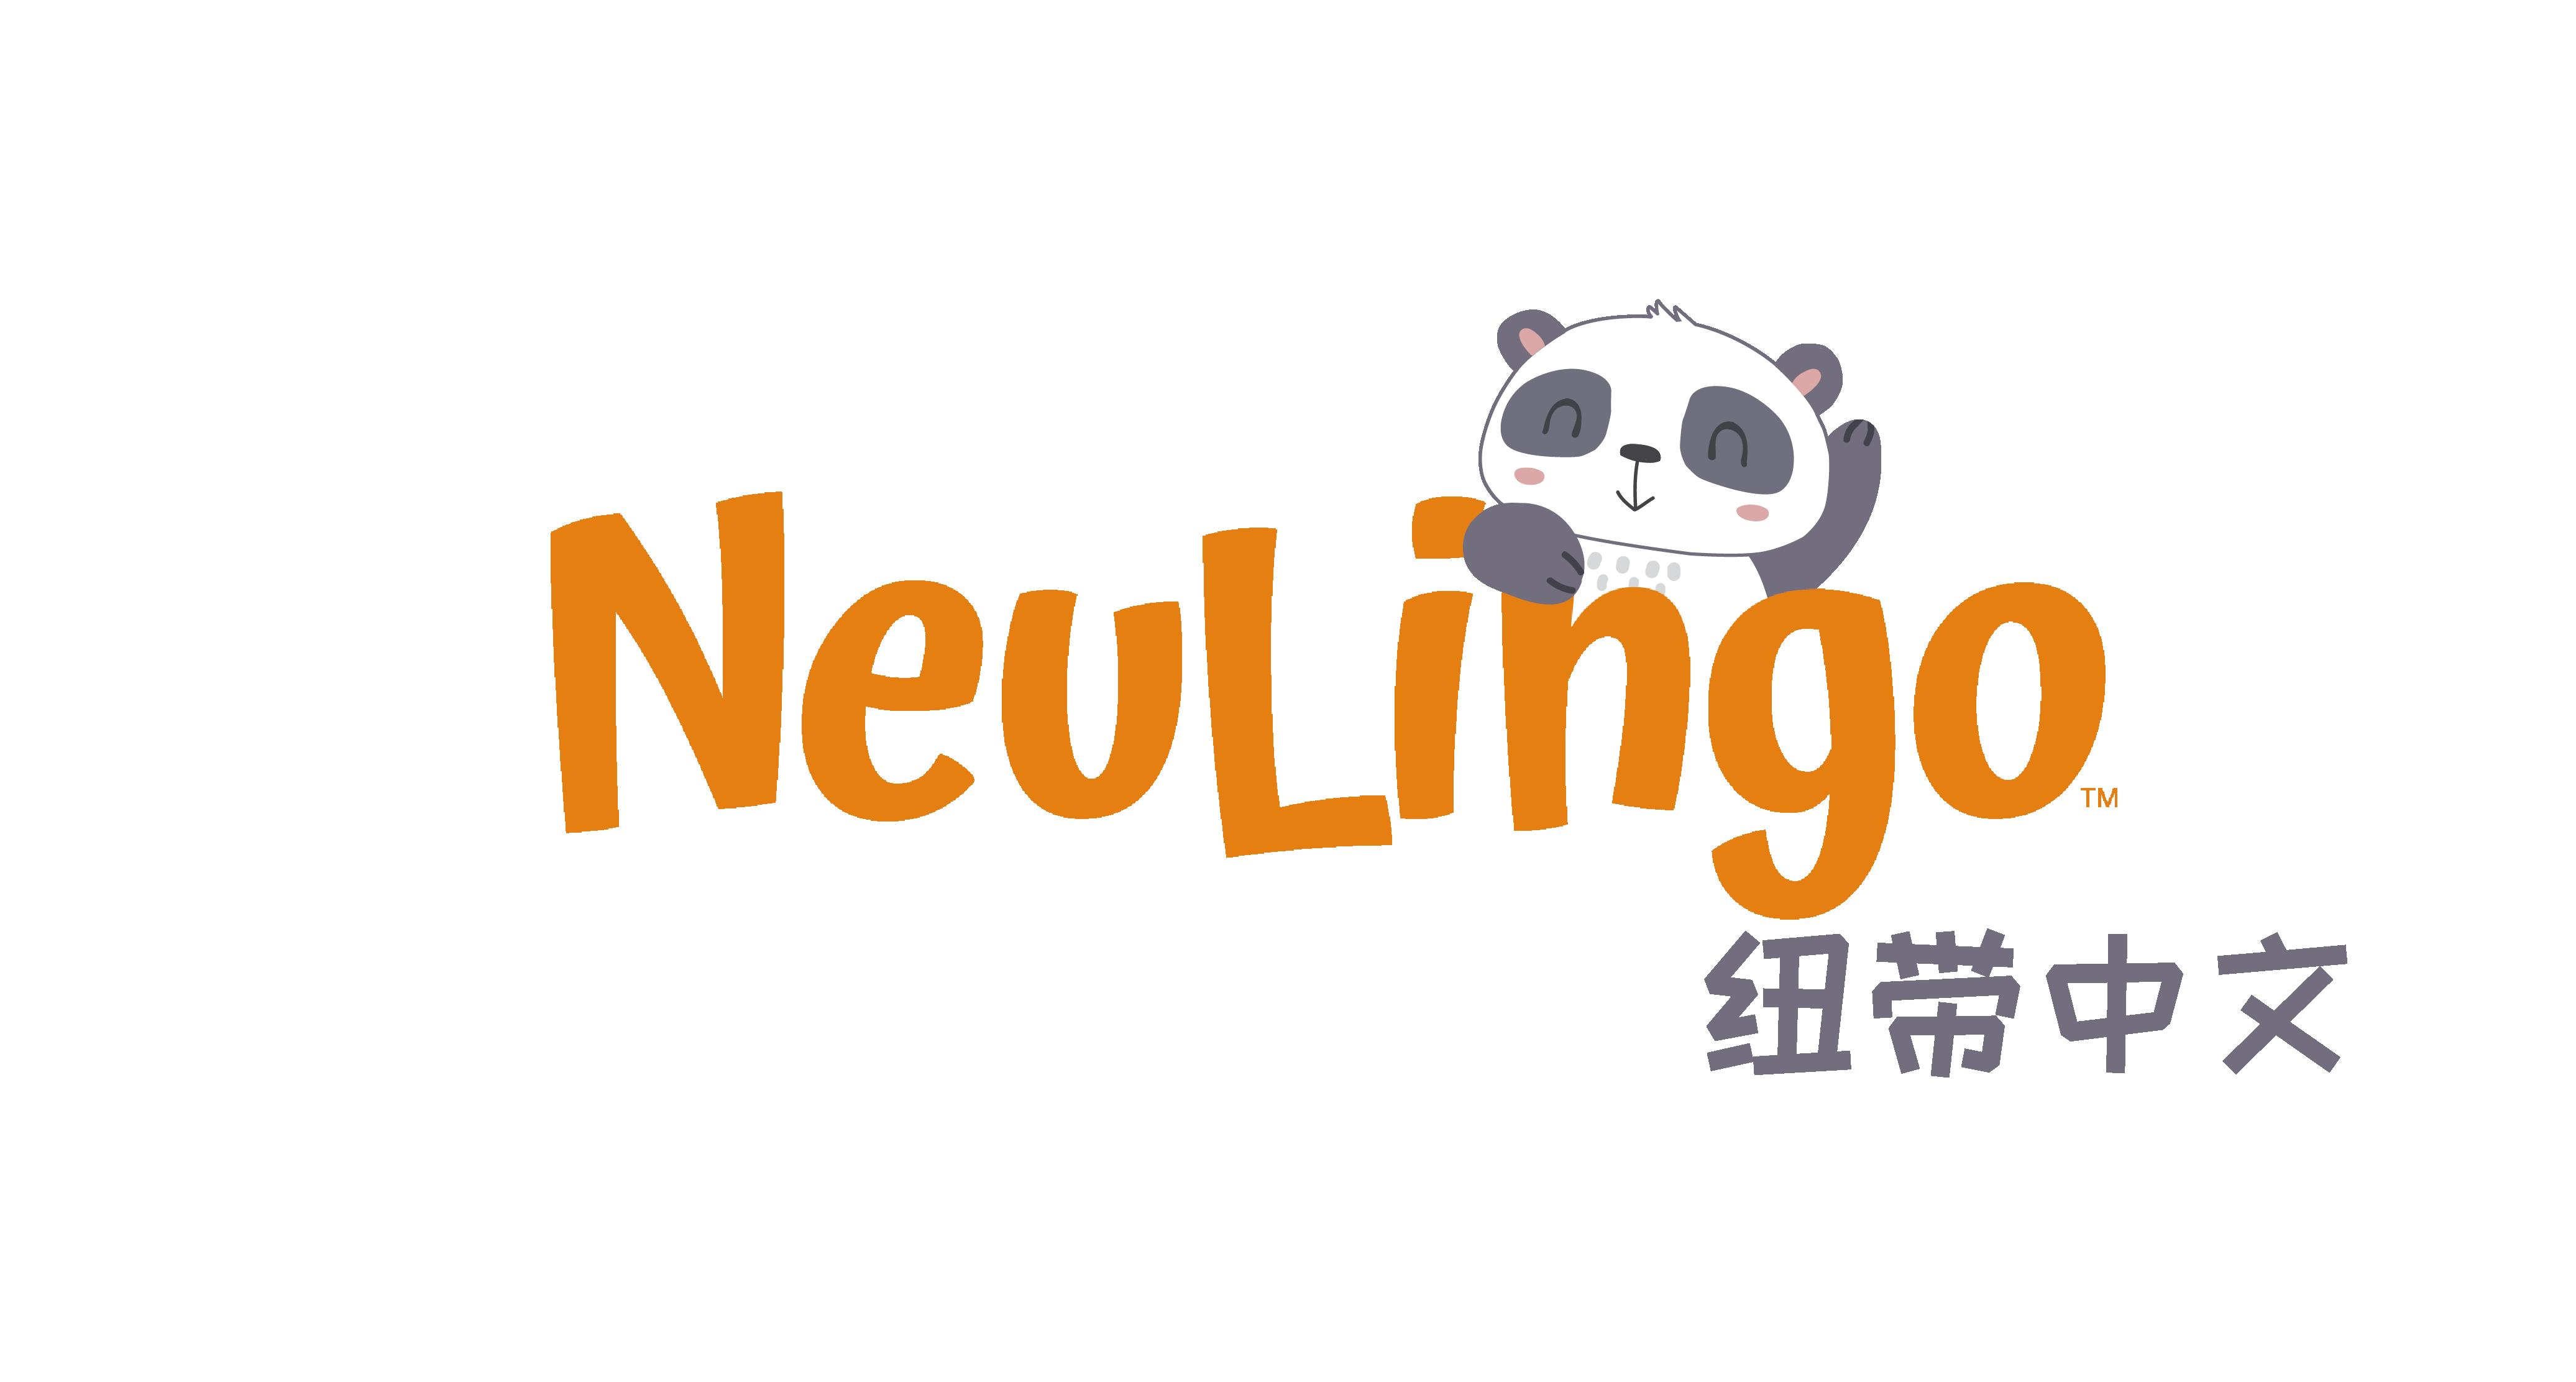 NeuLingo